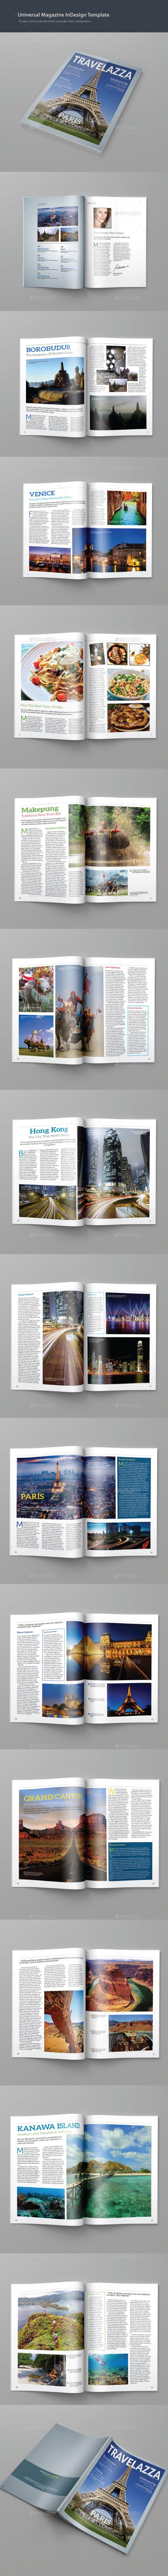 Travelazza Magazine - Magazines Print Templates